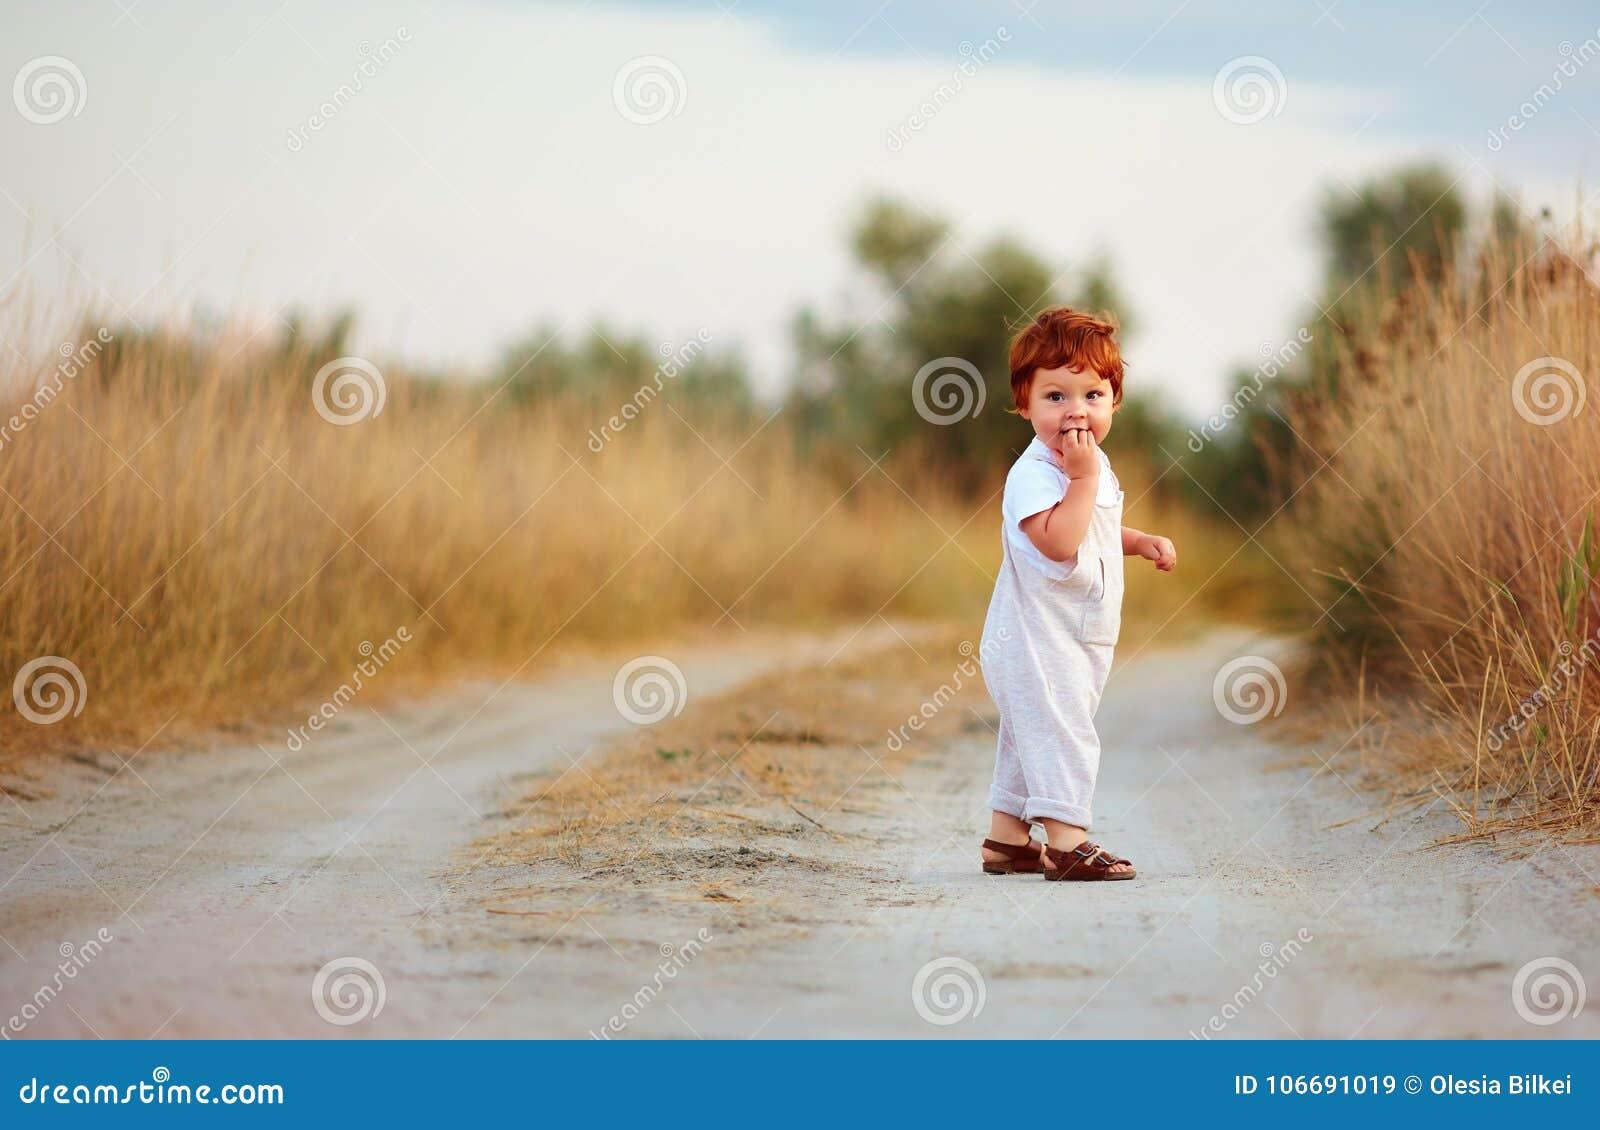 Cute little redhead baby boy walking on rural path at summer day